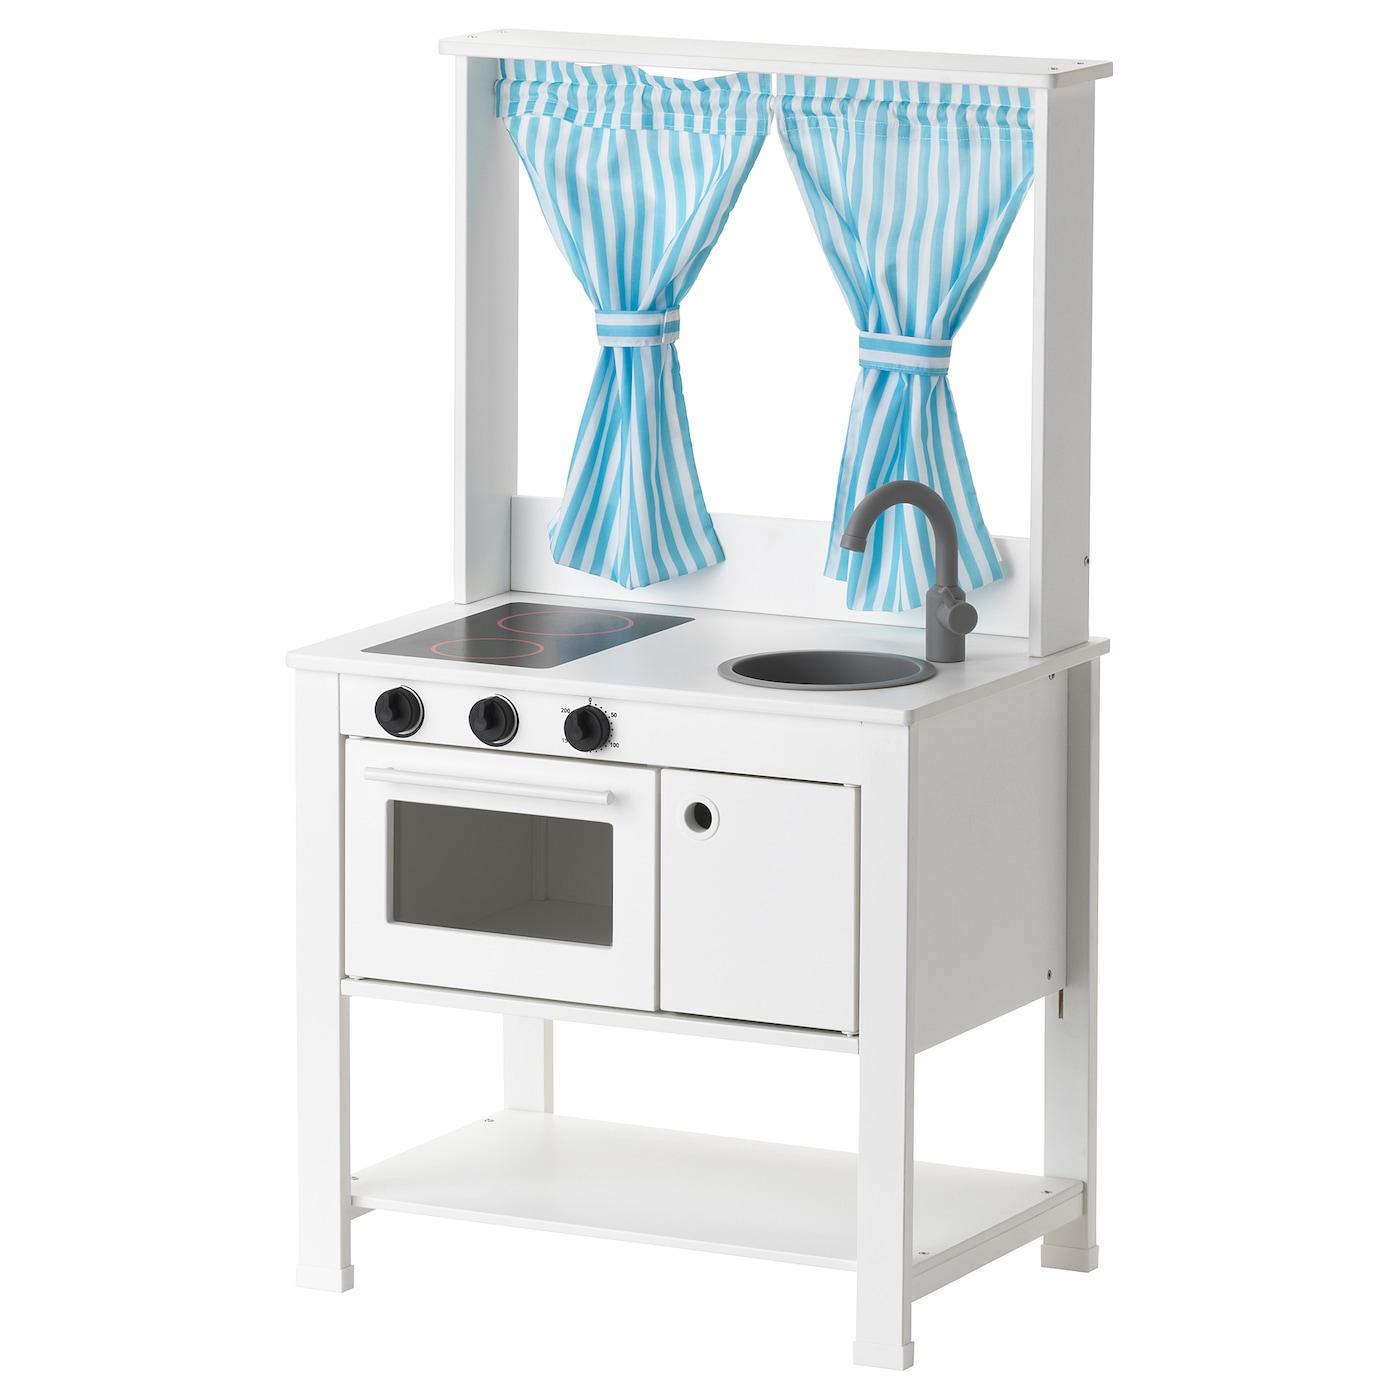 SPISIG cucina gioco IKEA con tende